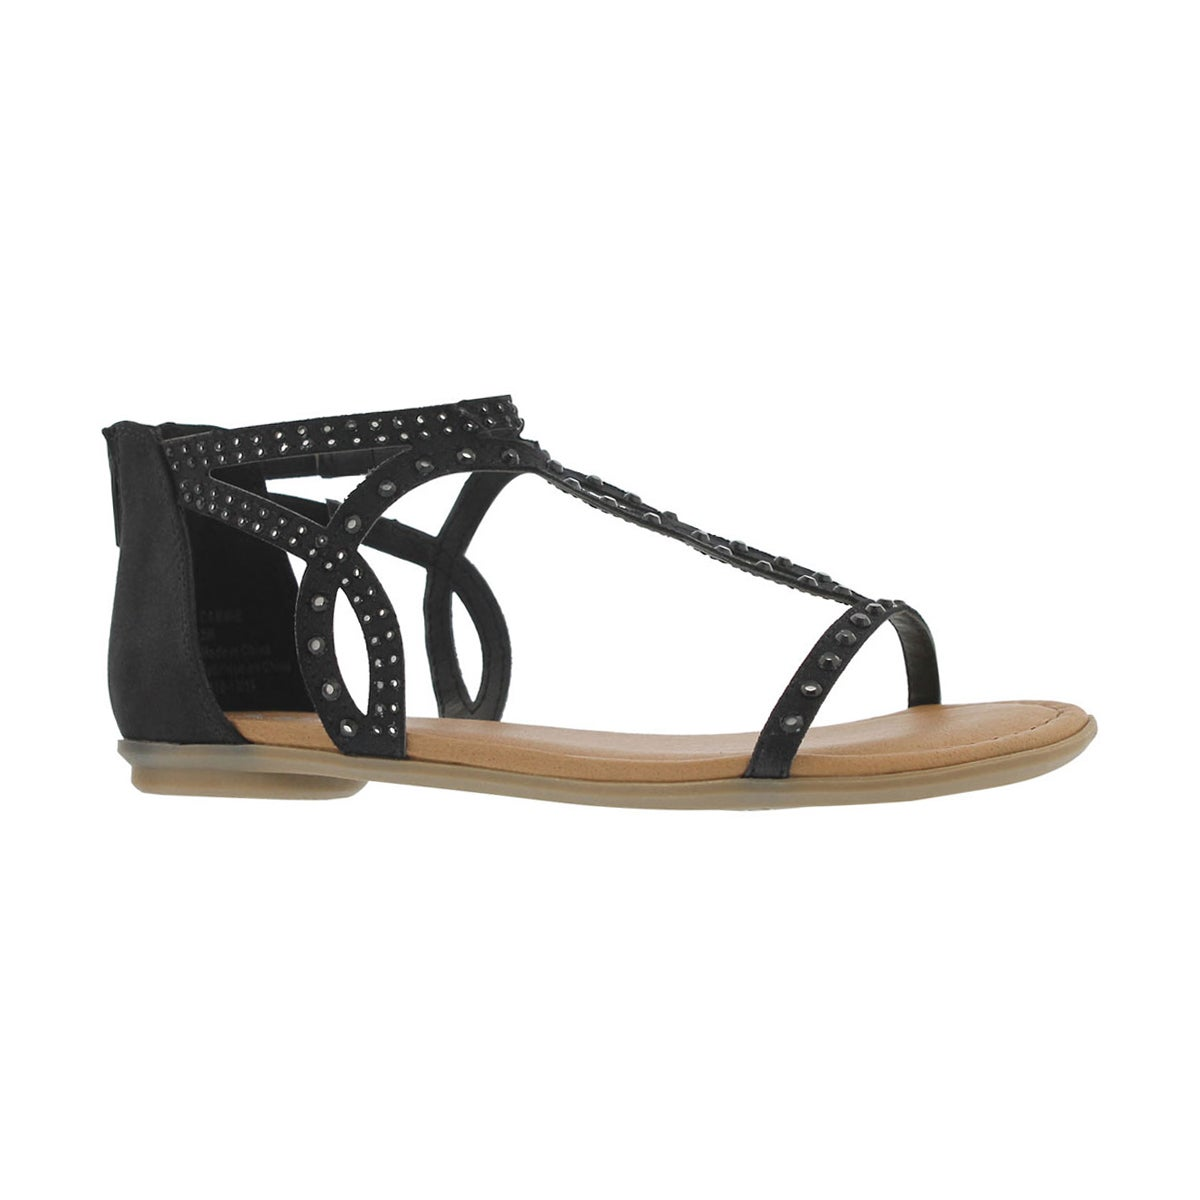 Girls' CAMMIE black dress sandals